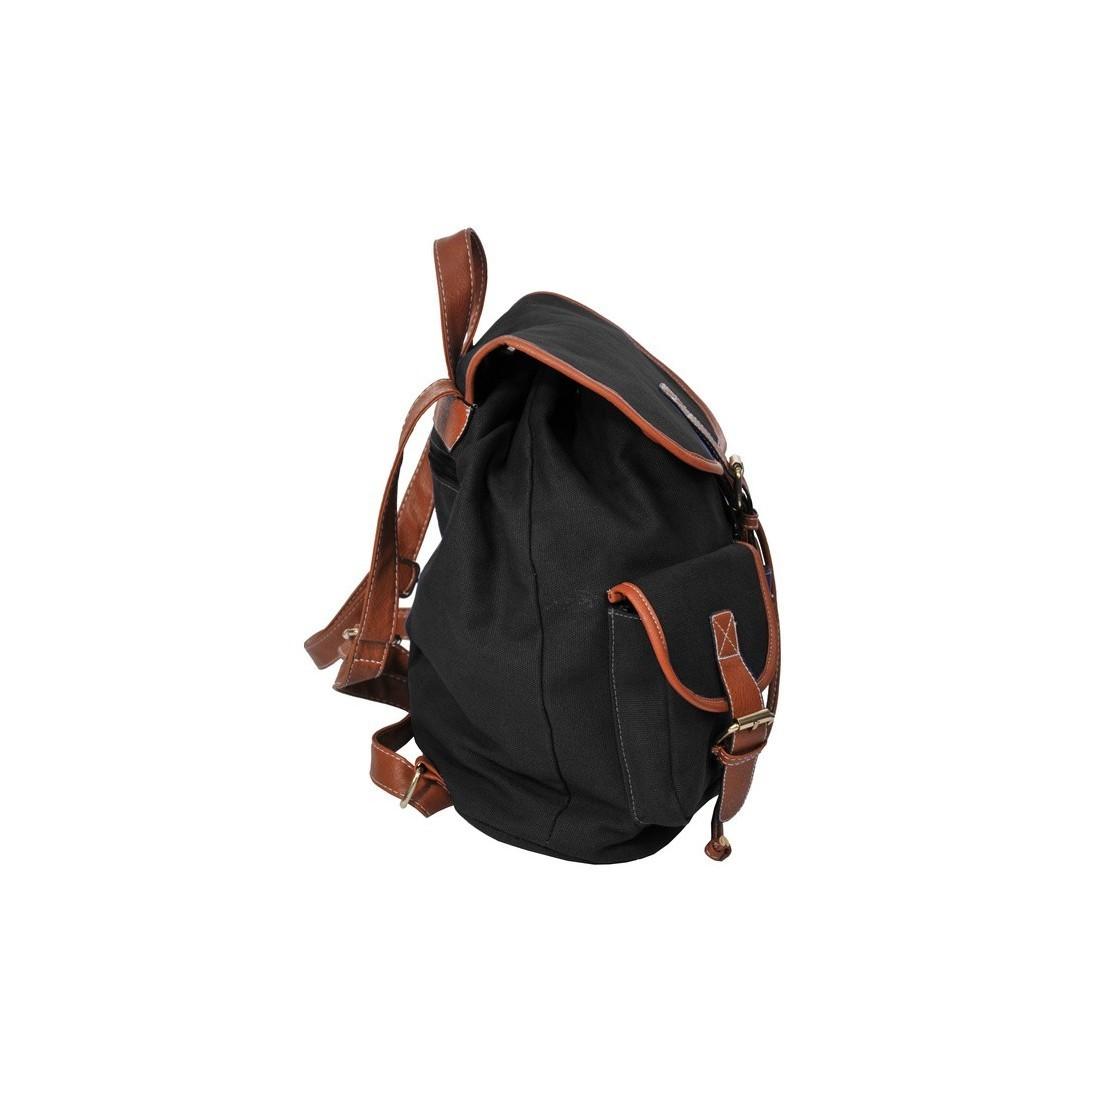 Plecak młodzieżowy Canvas Vintage czarny - plecak-tornister.pl